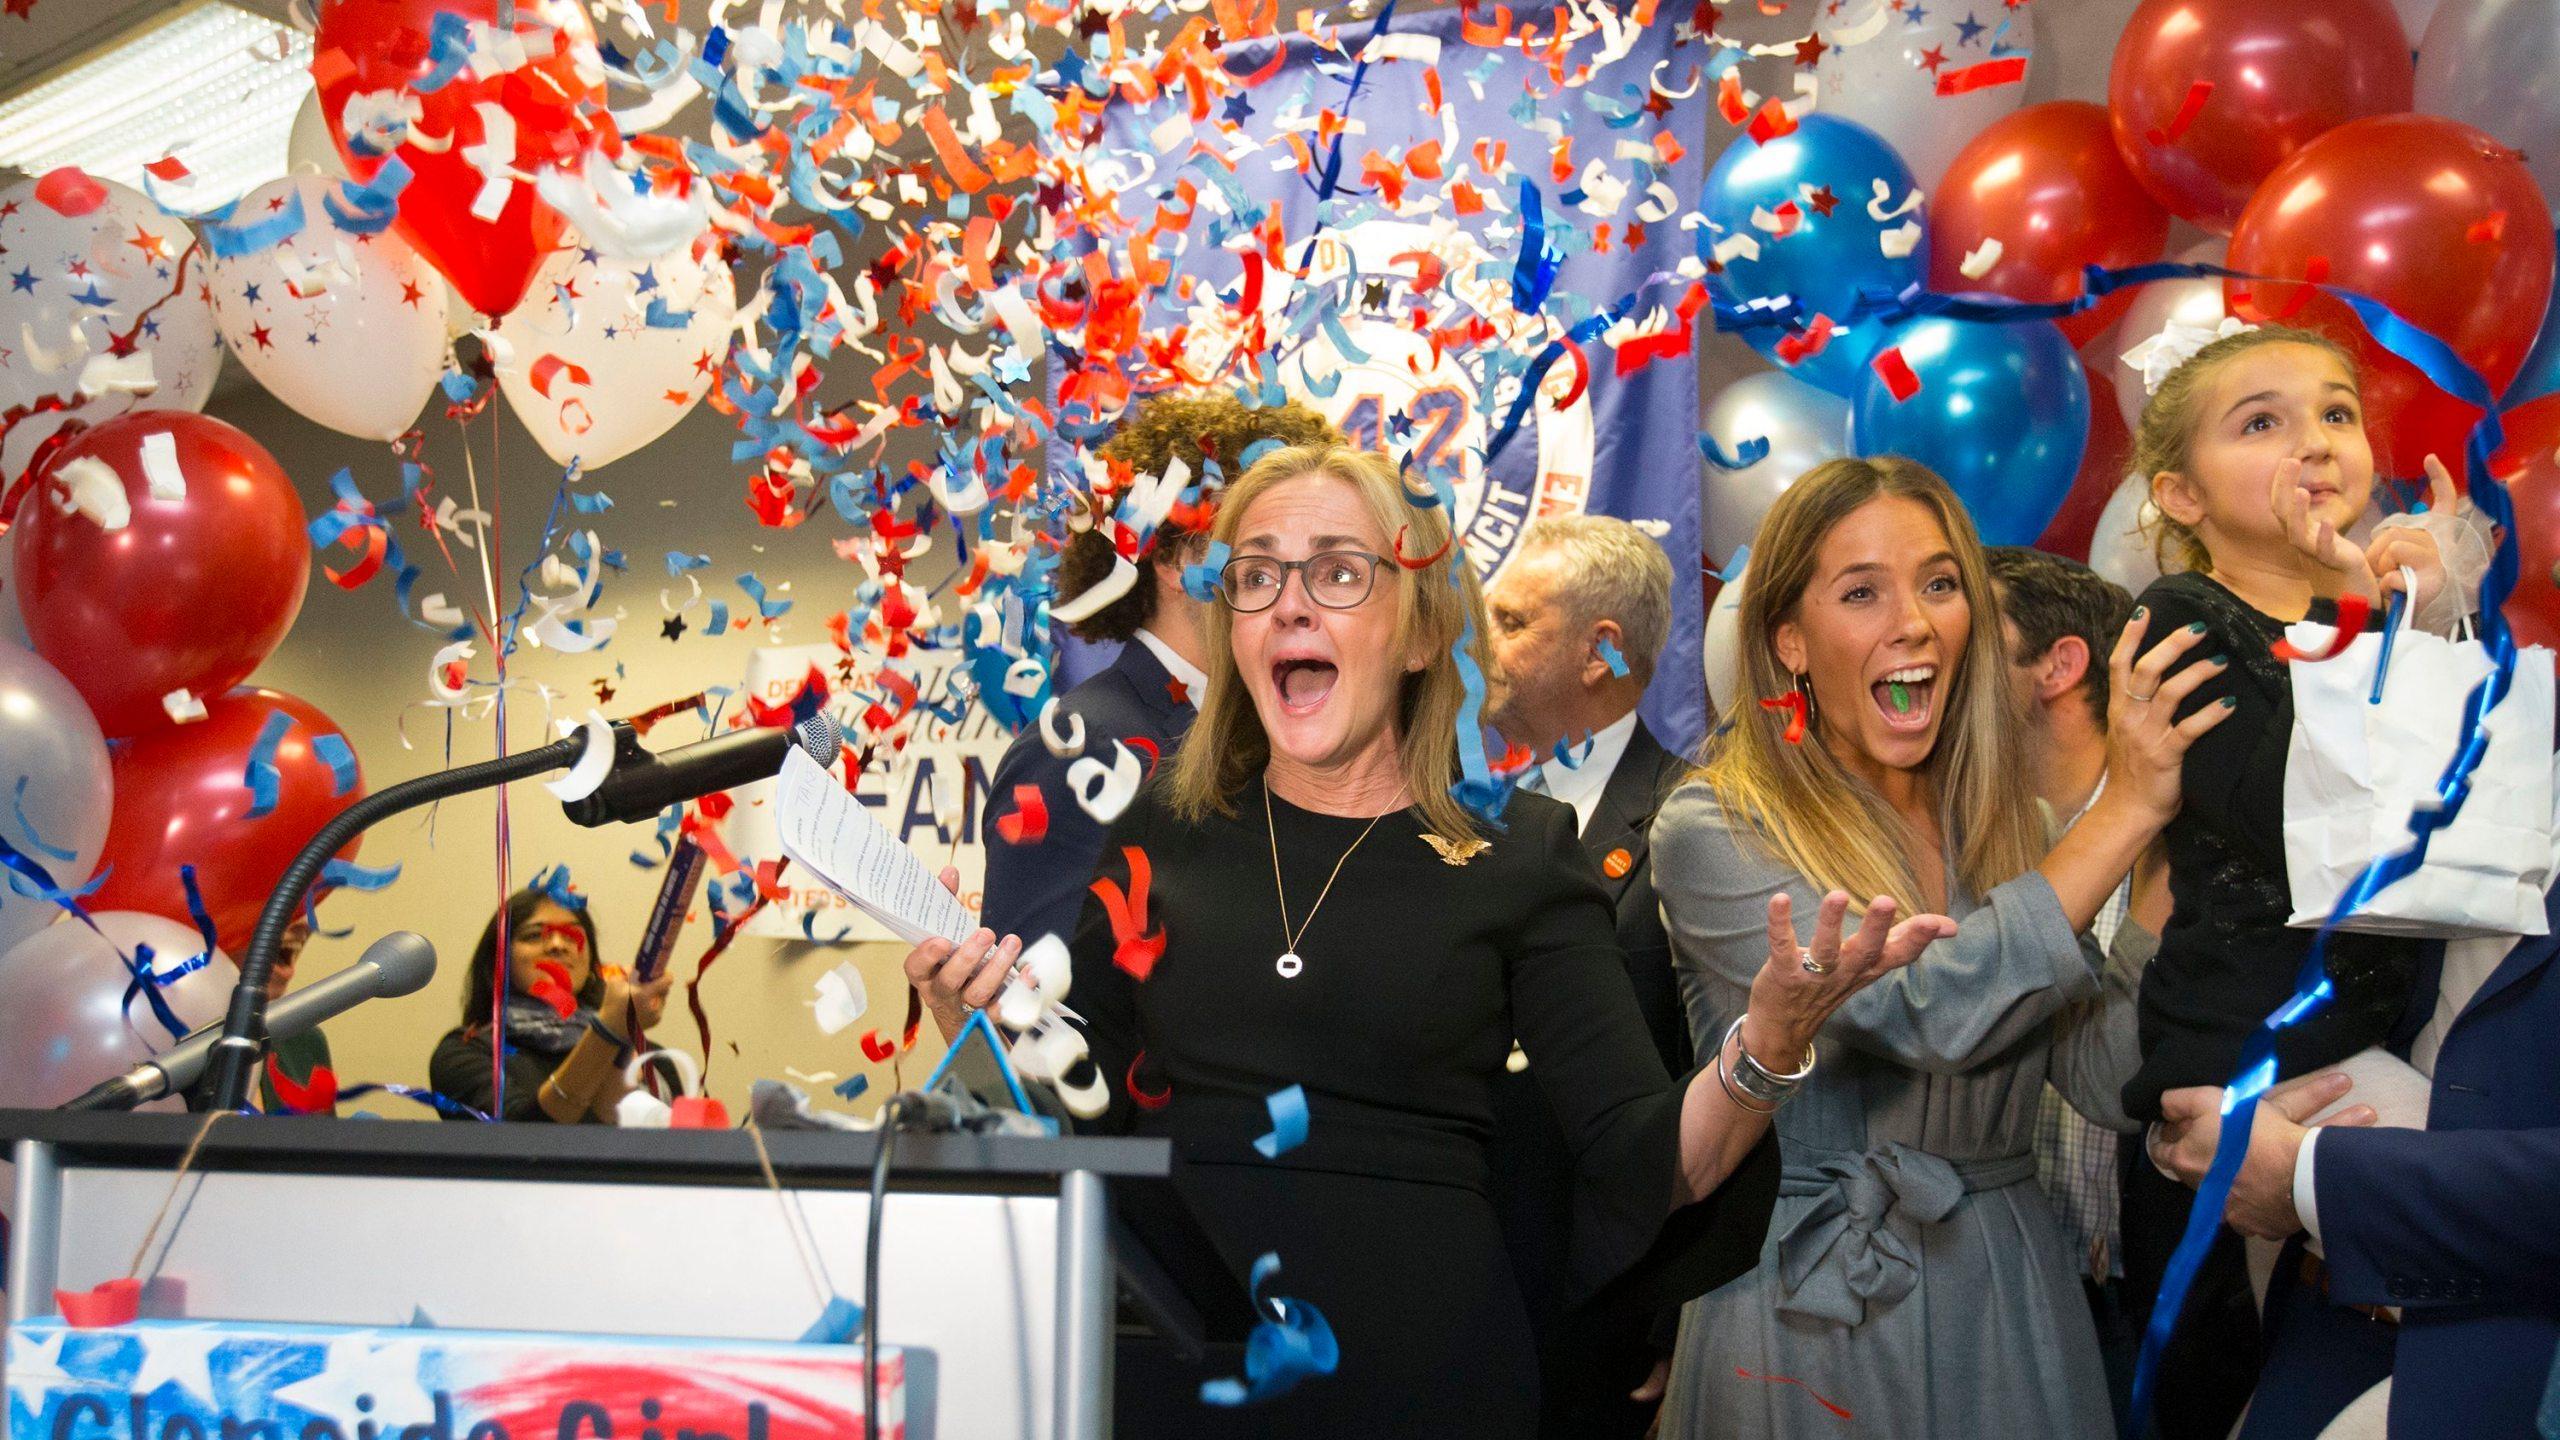 APTOPIX_Election_2018_House_Dean_Pennsylvania_67875-159532.jpg60816080